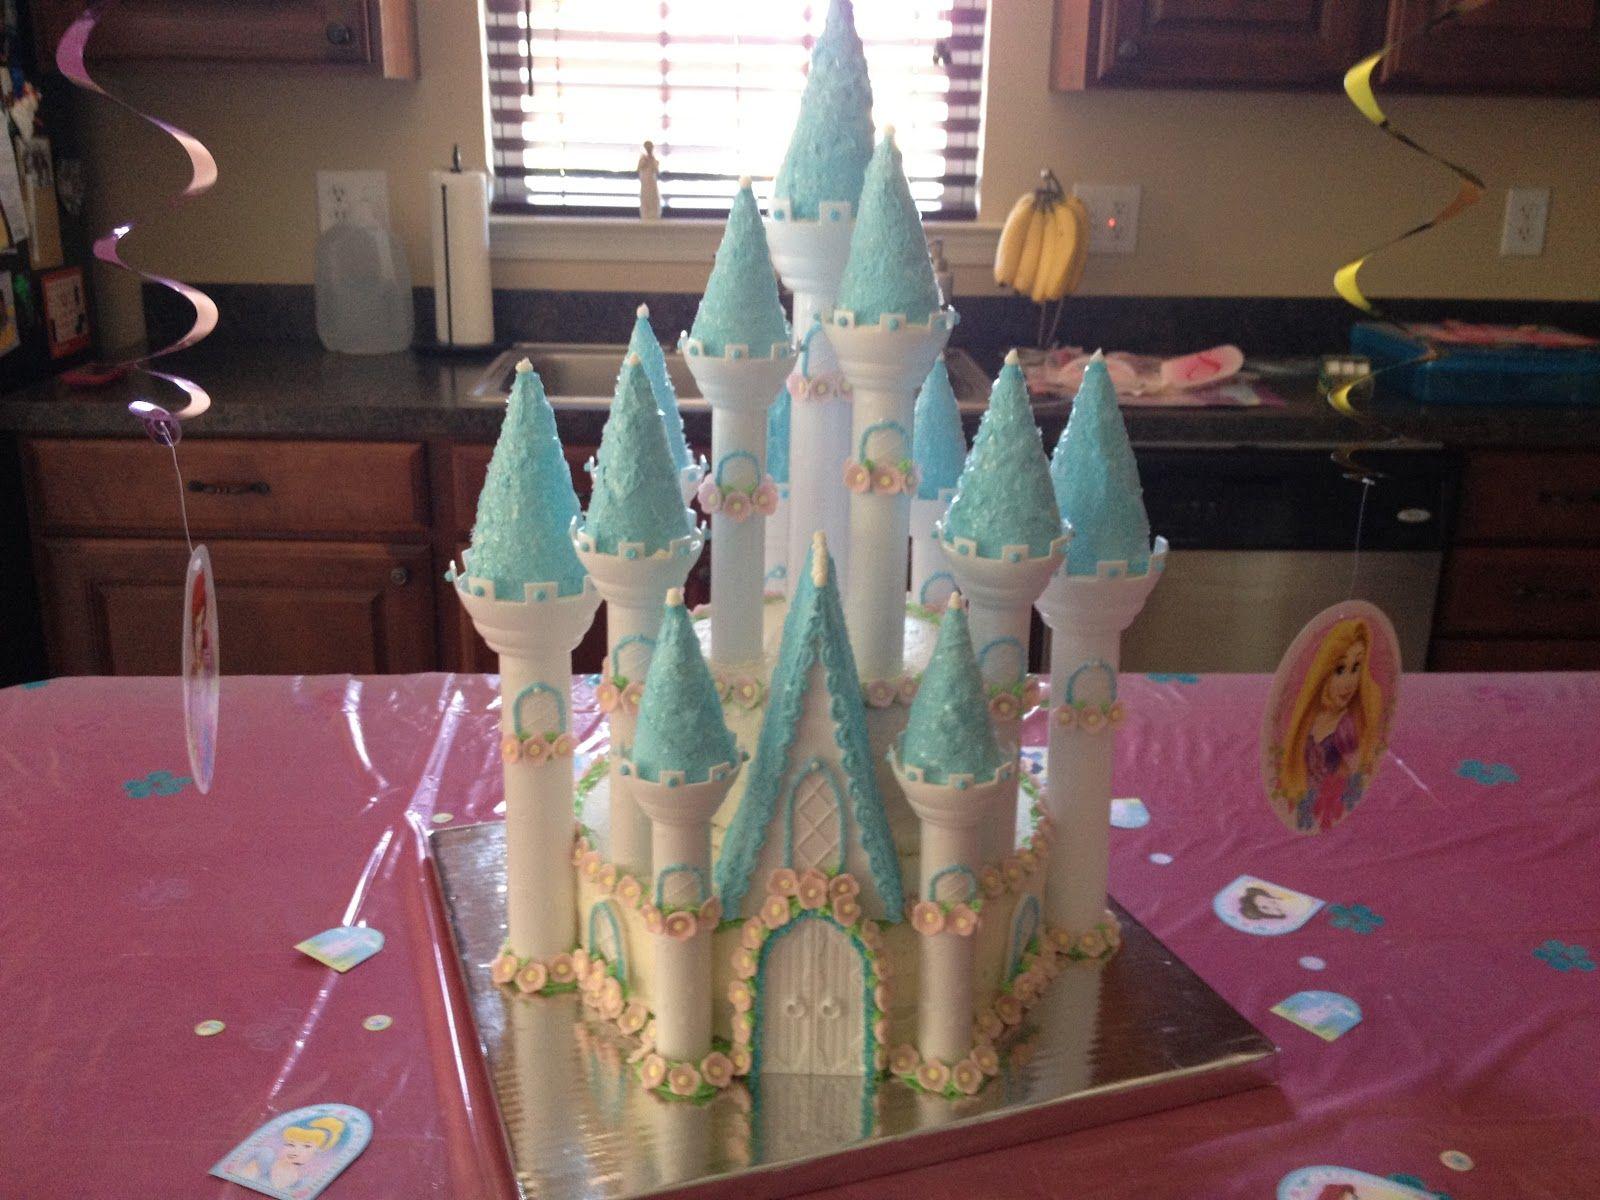 Disney princess castle cake using wilton castle cake kit and